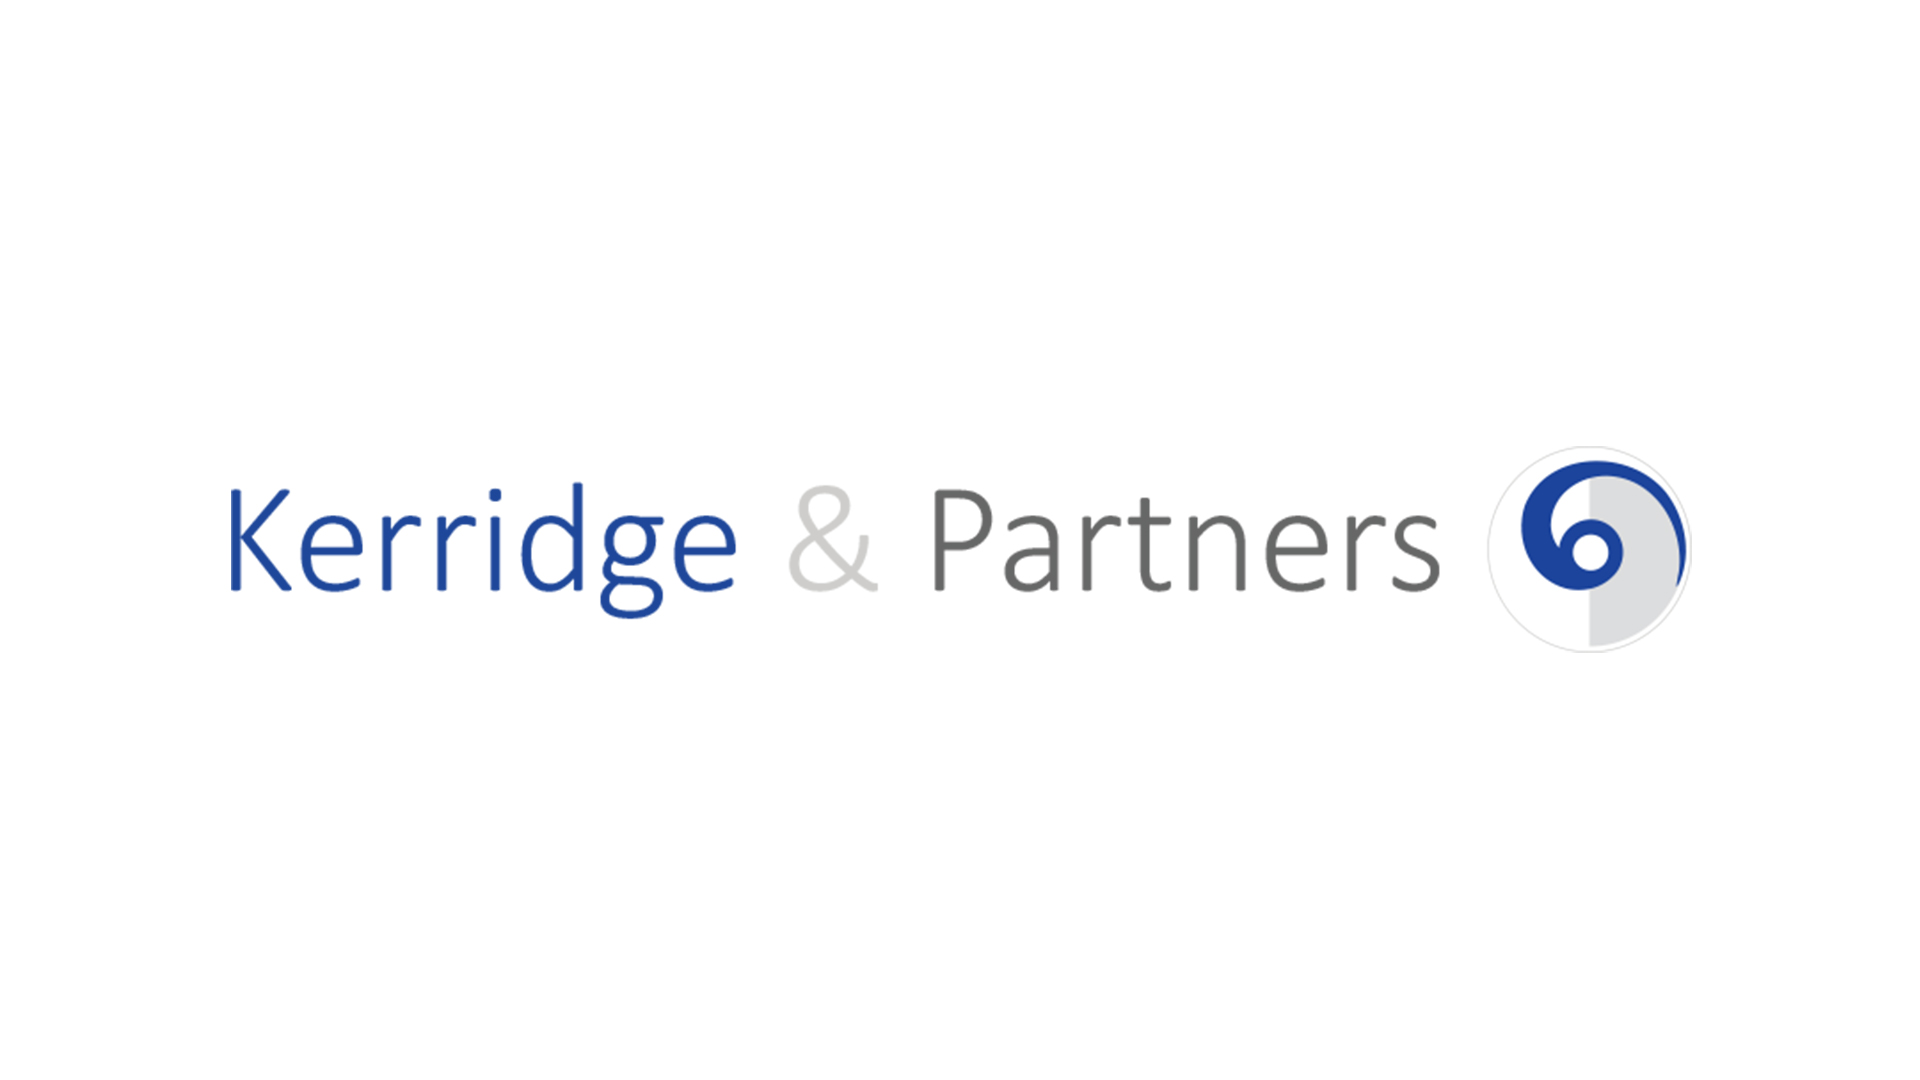 Kerridge & Partners